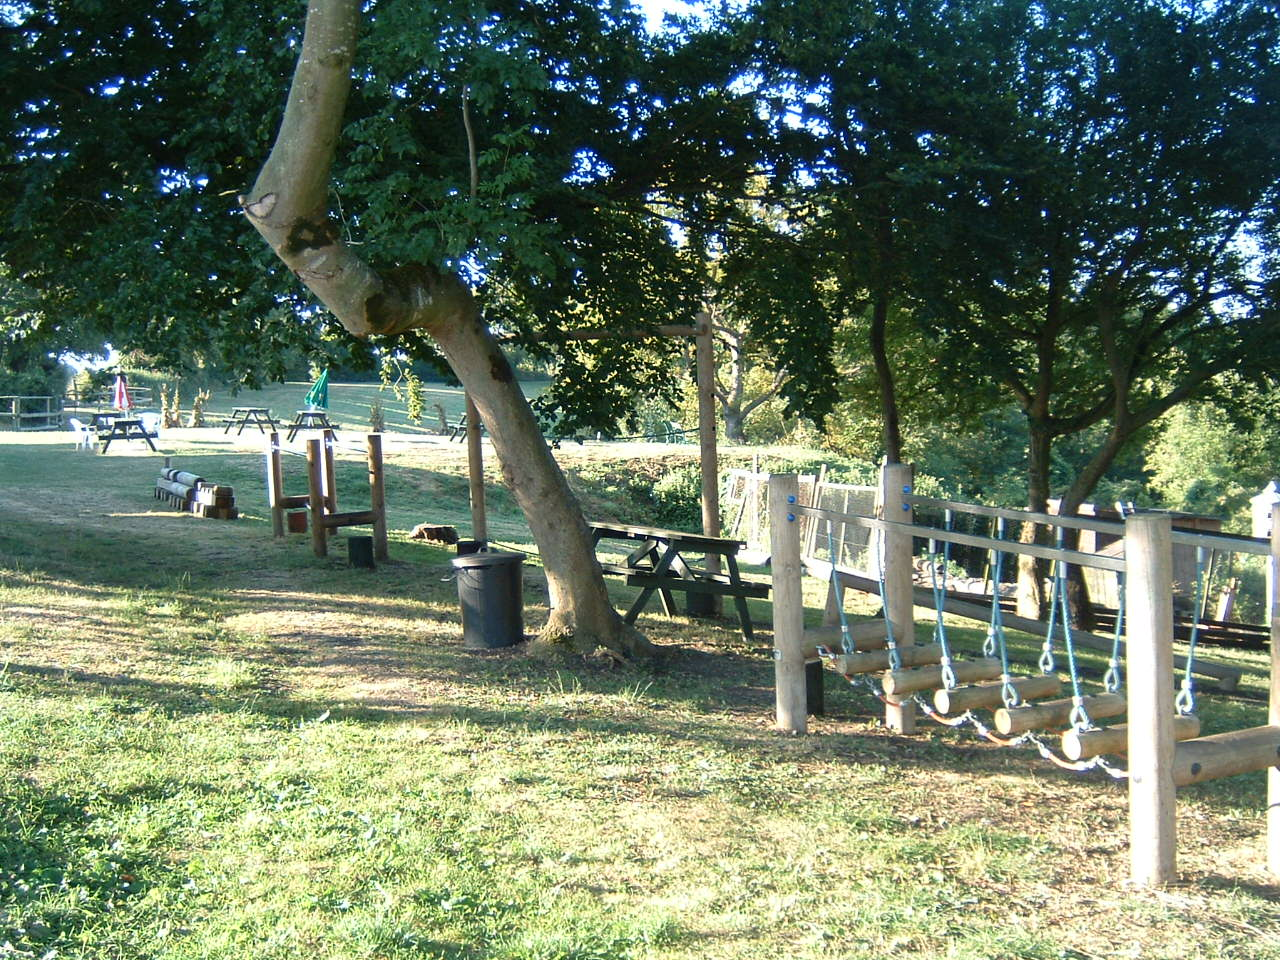 Bar price list for bowdenscrest caravan park - Bowdens Crest Caravan Camping Park Langport Somerset